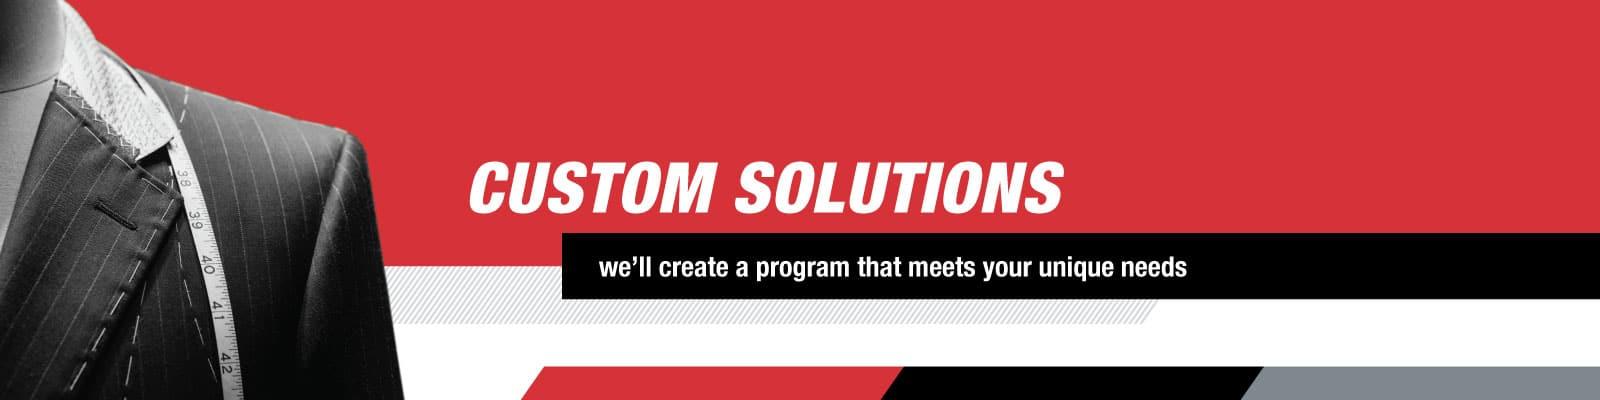 Hero-custom-solutions-400-3-1